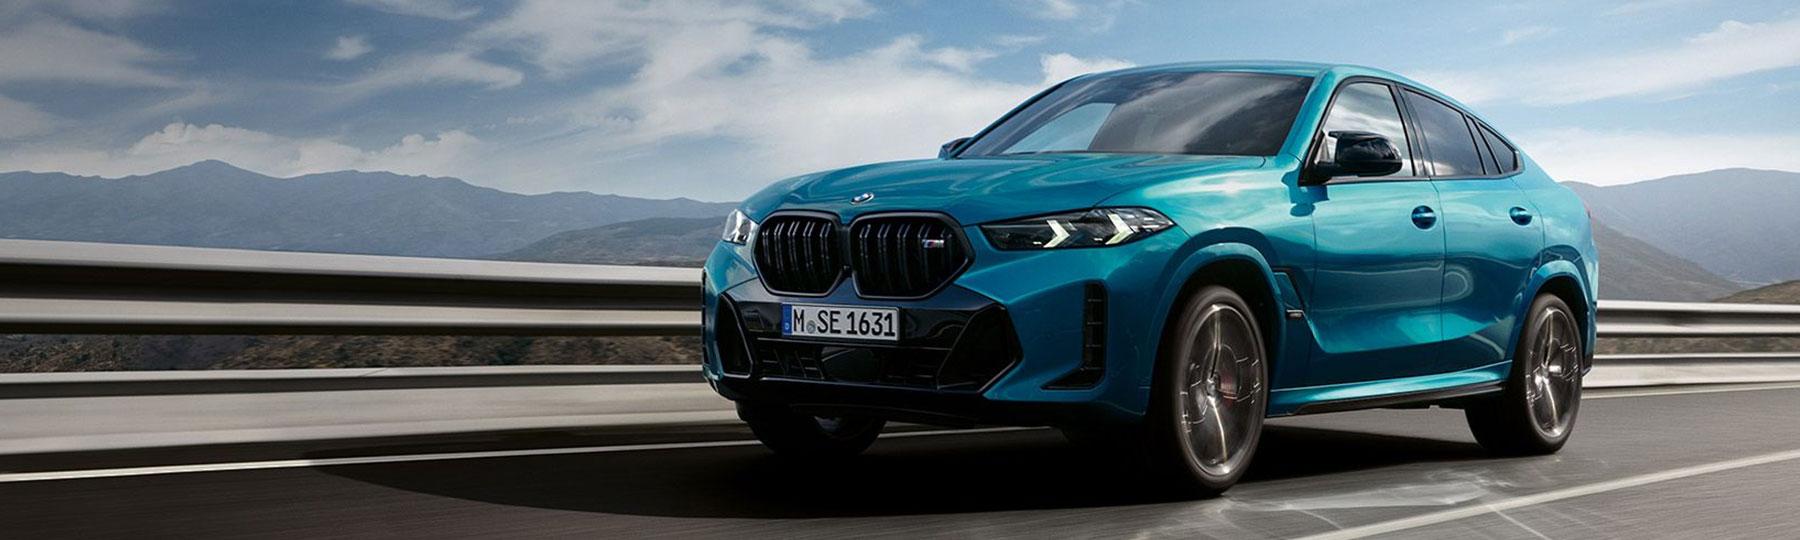 BMW X6 New Car Offer